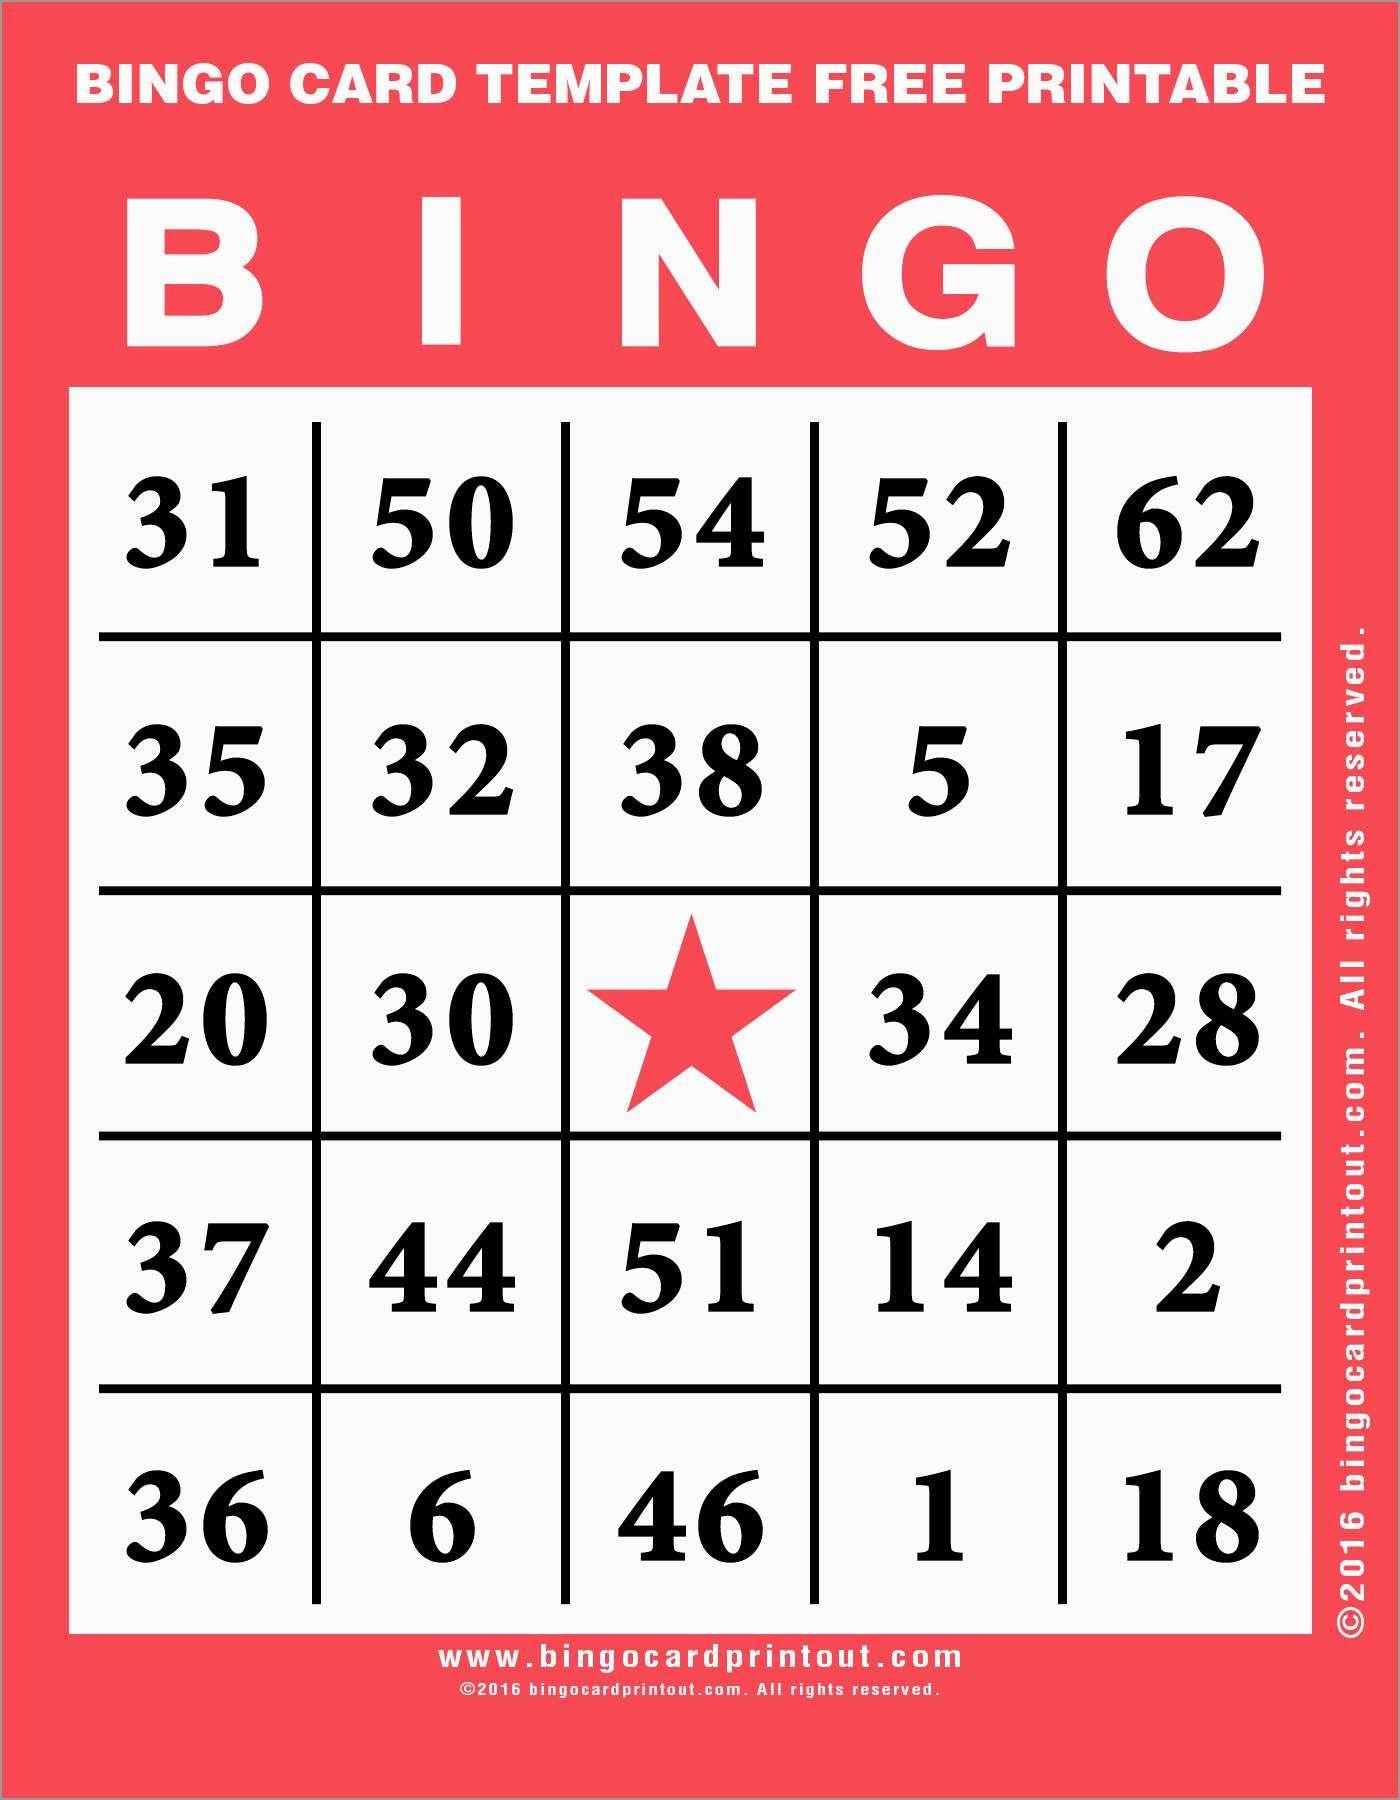 Bingo Card Template Free Great Free Printable Bingo Cards Template - Printable Bingo Template Free